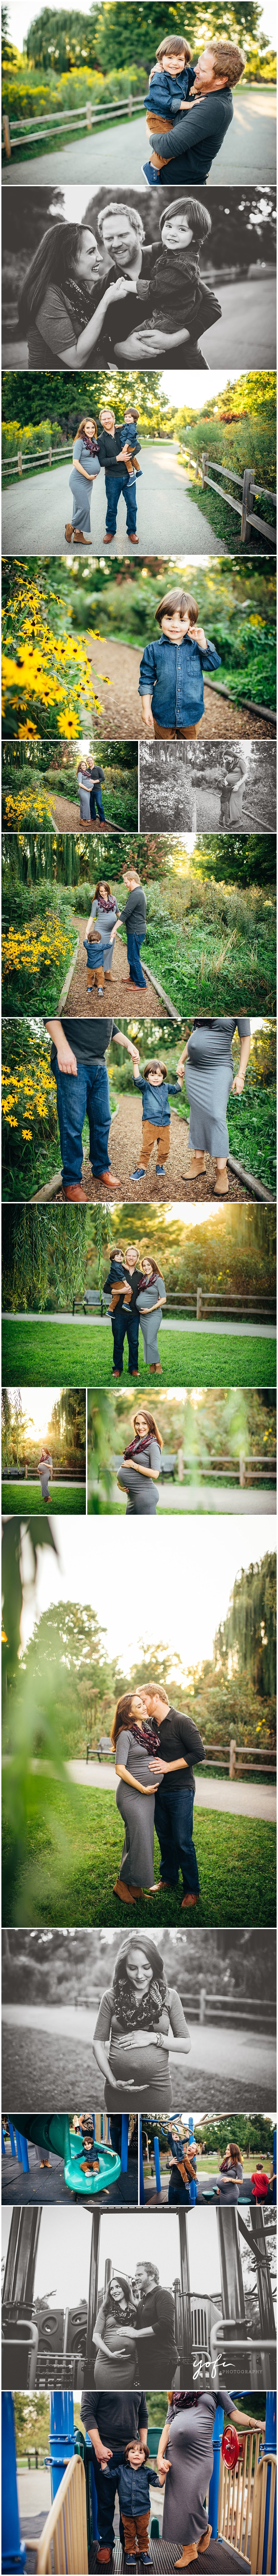 09.20.2016-yofiphotography-Callahan-Family-3_WEB